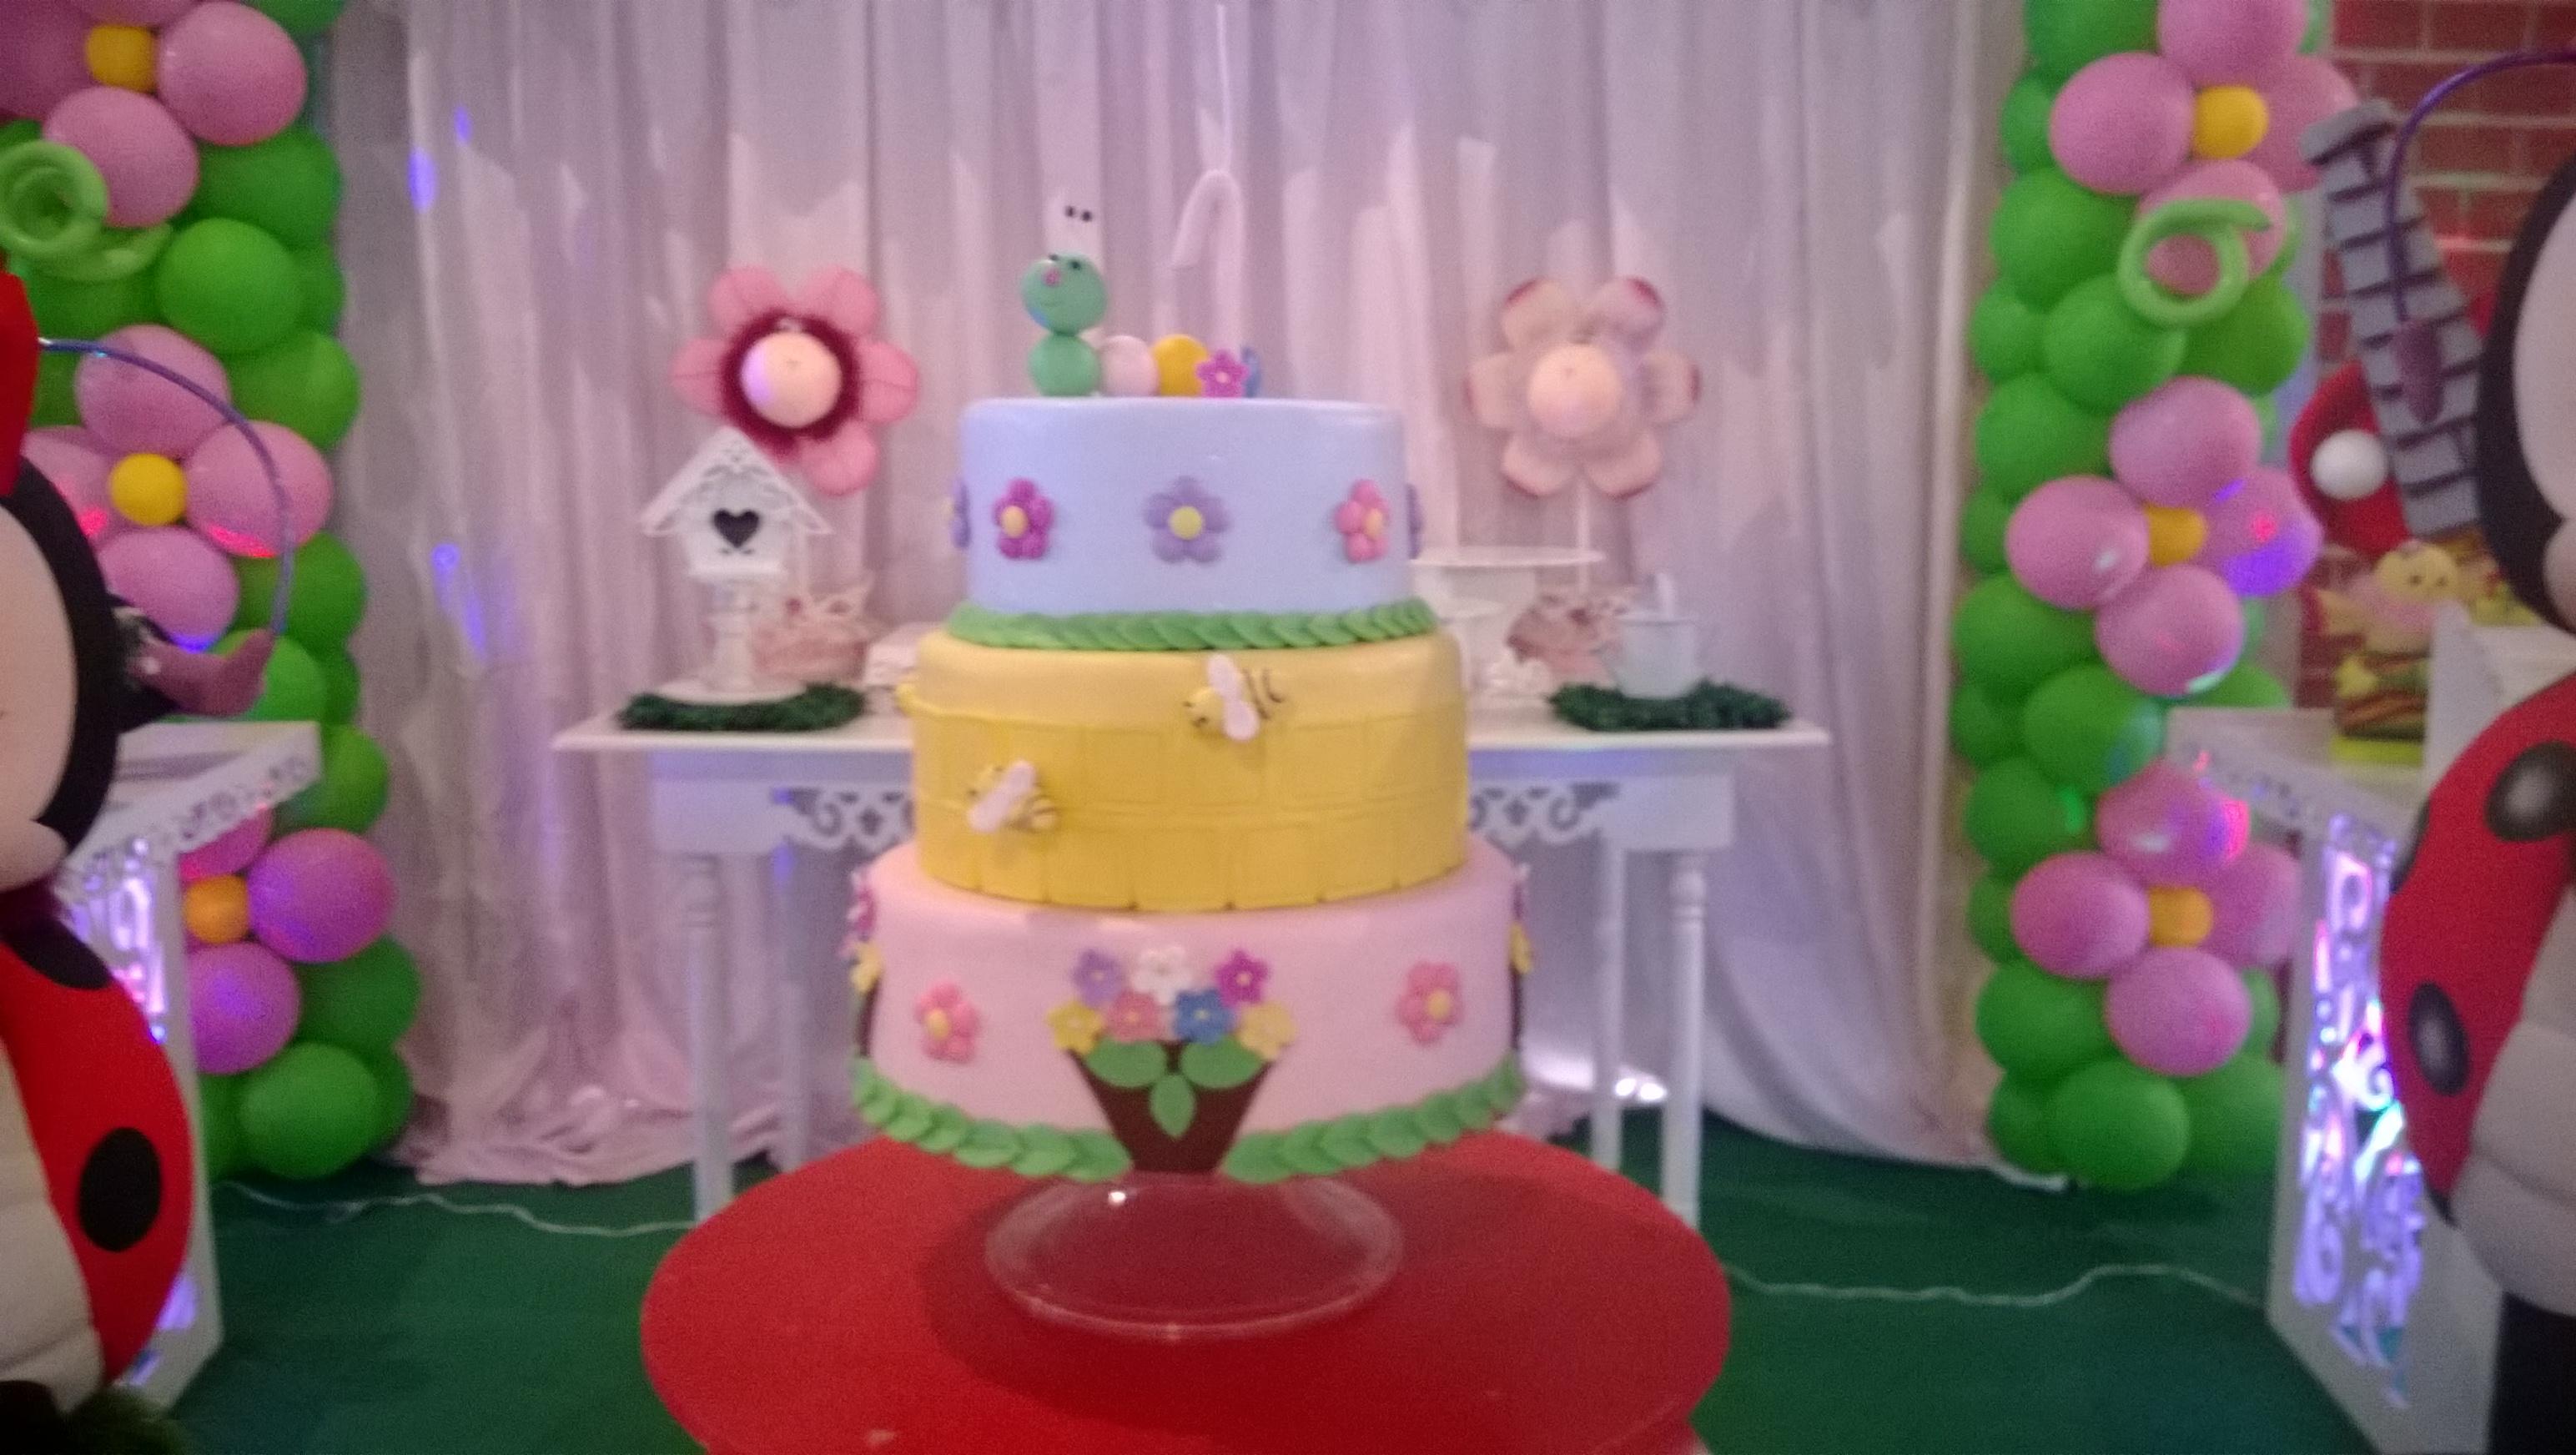 decoracao festa surpresa : decoracao festa surpresa:decoracao festa jardim encantado menina decoracao festa jardim